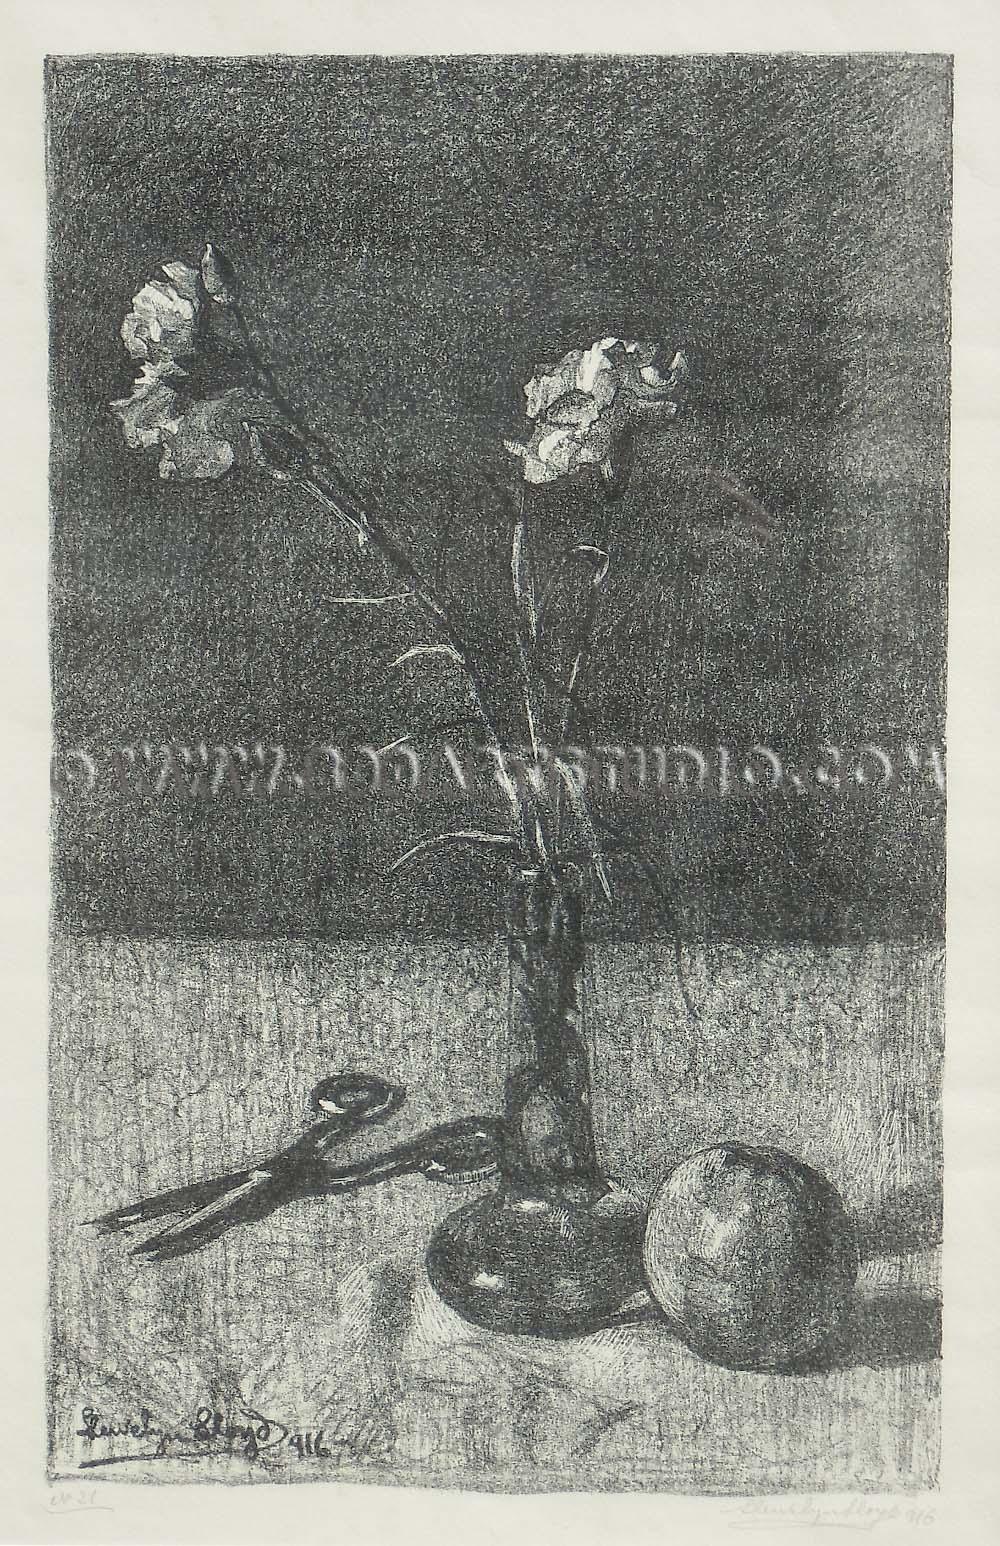 Llewelyn Lloyd - Natura morta